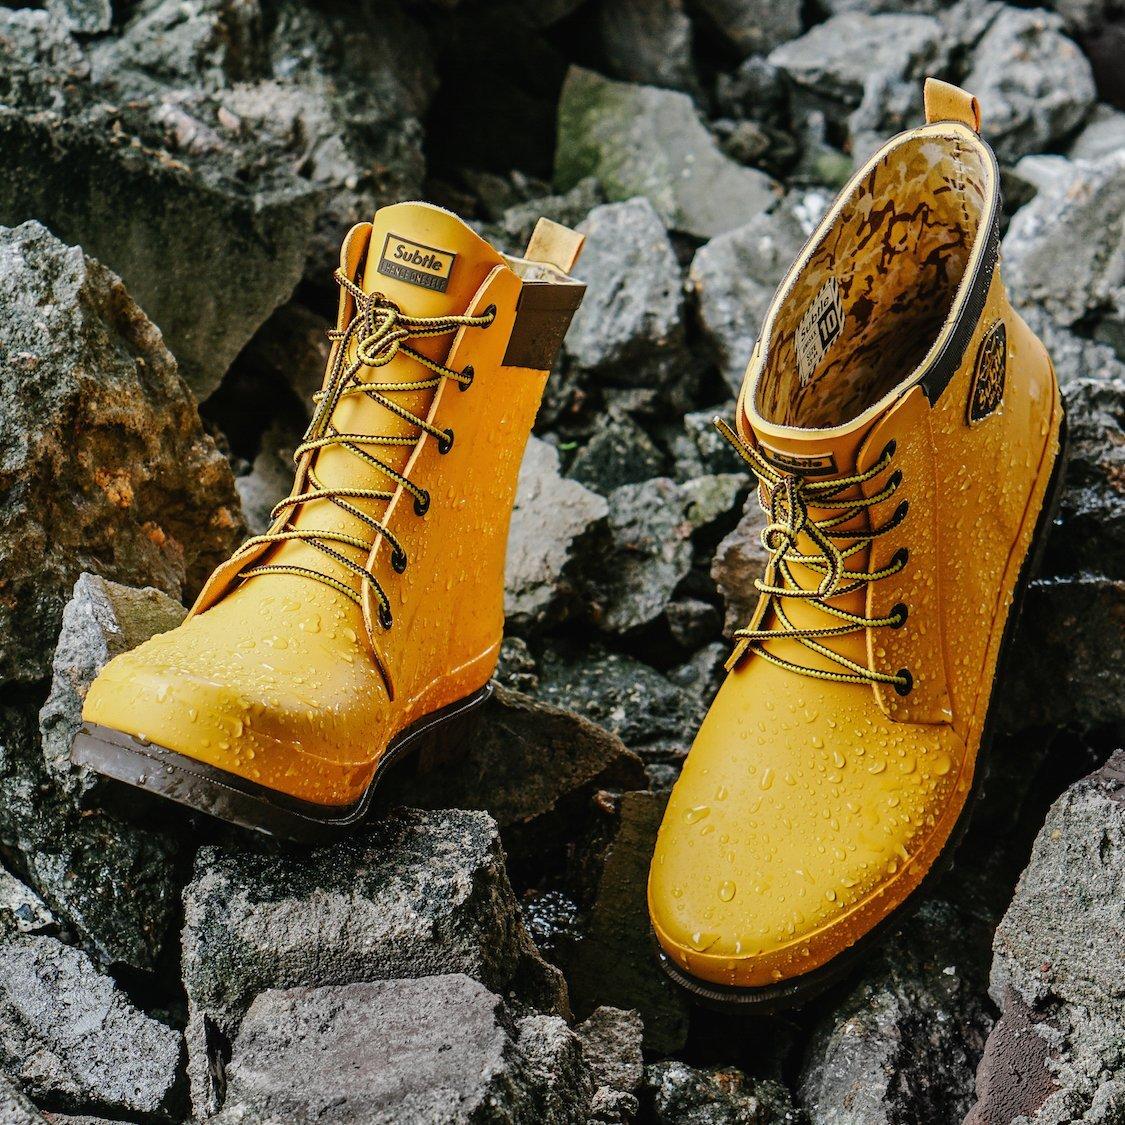 Mr.Rain X1 Yellow Handmade Unisex Rainboots by Subtle